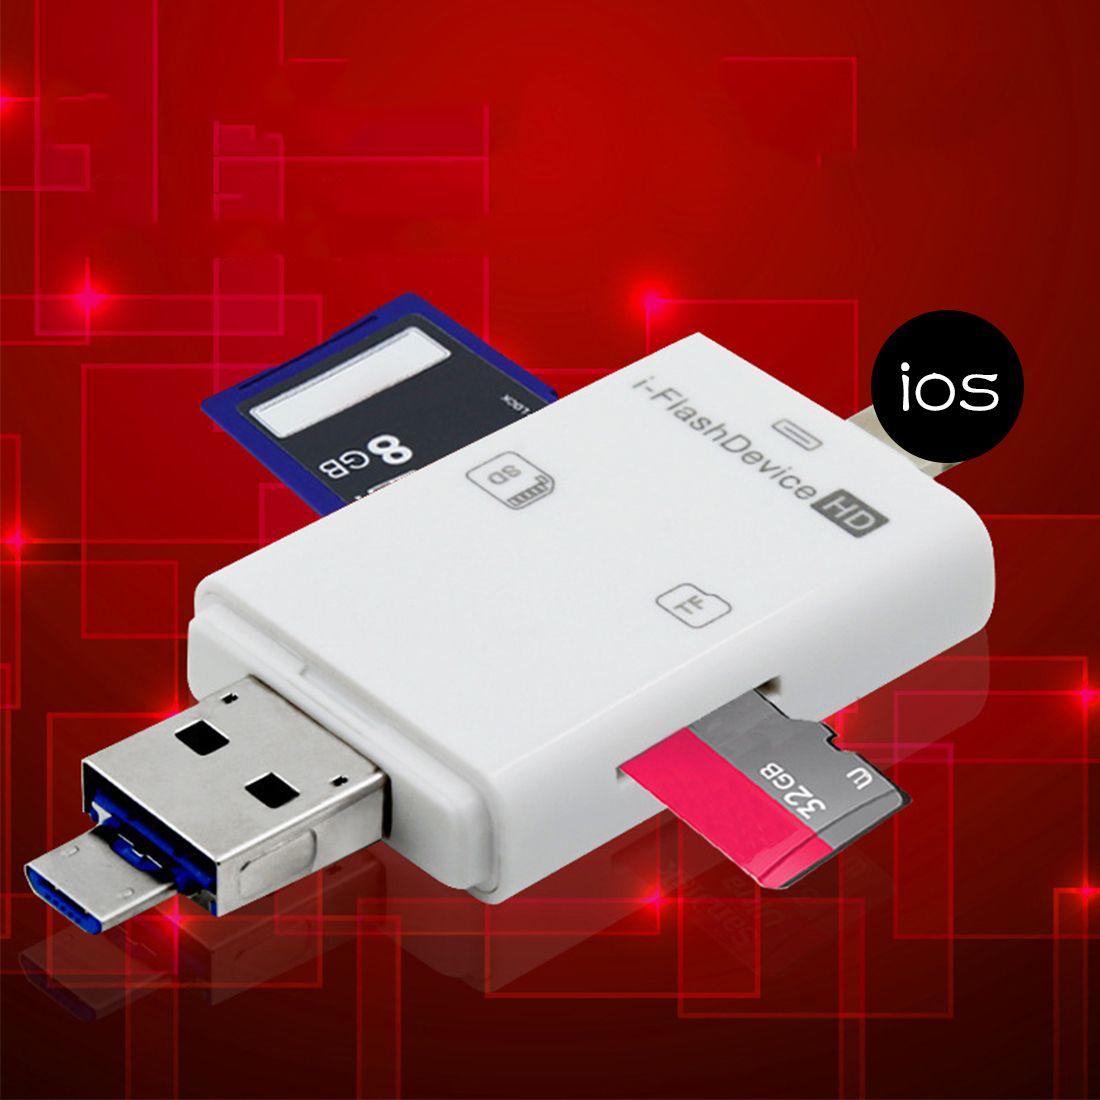 NOYOKERE 3in1 Micro USB Lecteur Micro SD SDHC TF SD carte Pour iPhone 5/5S/6/6 7 plus/ipad pro air/Samsung/LG/HTC Andrid OTG téléphones